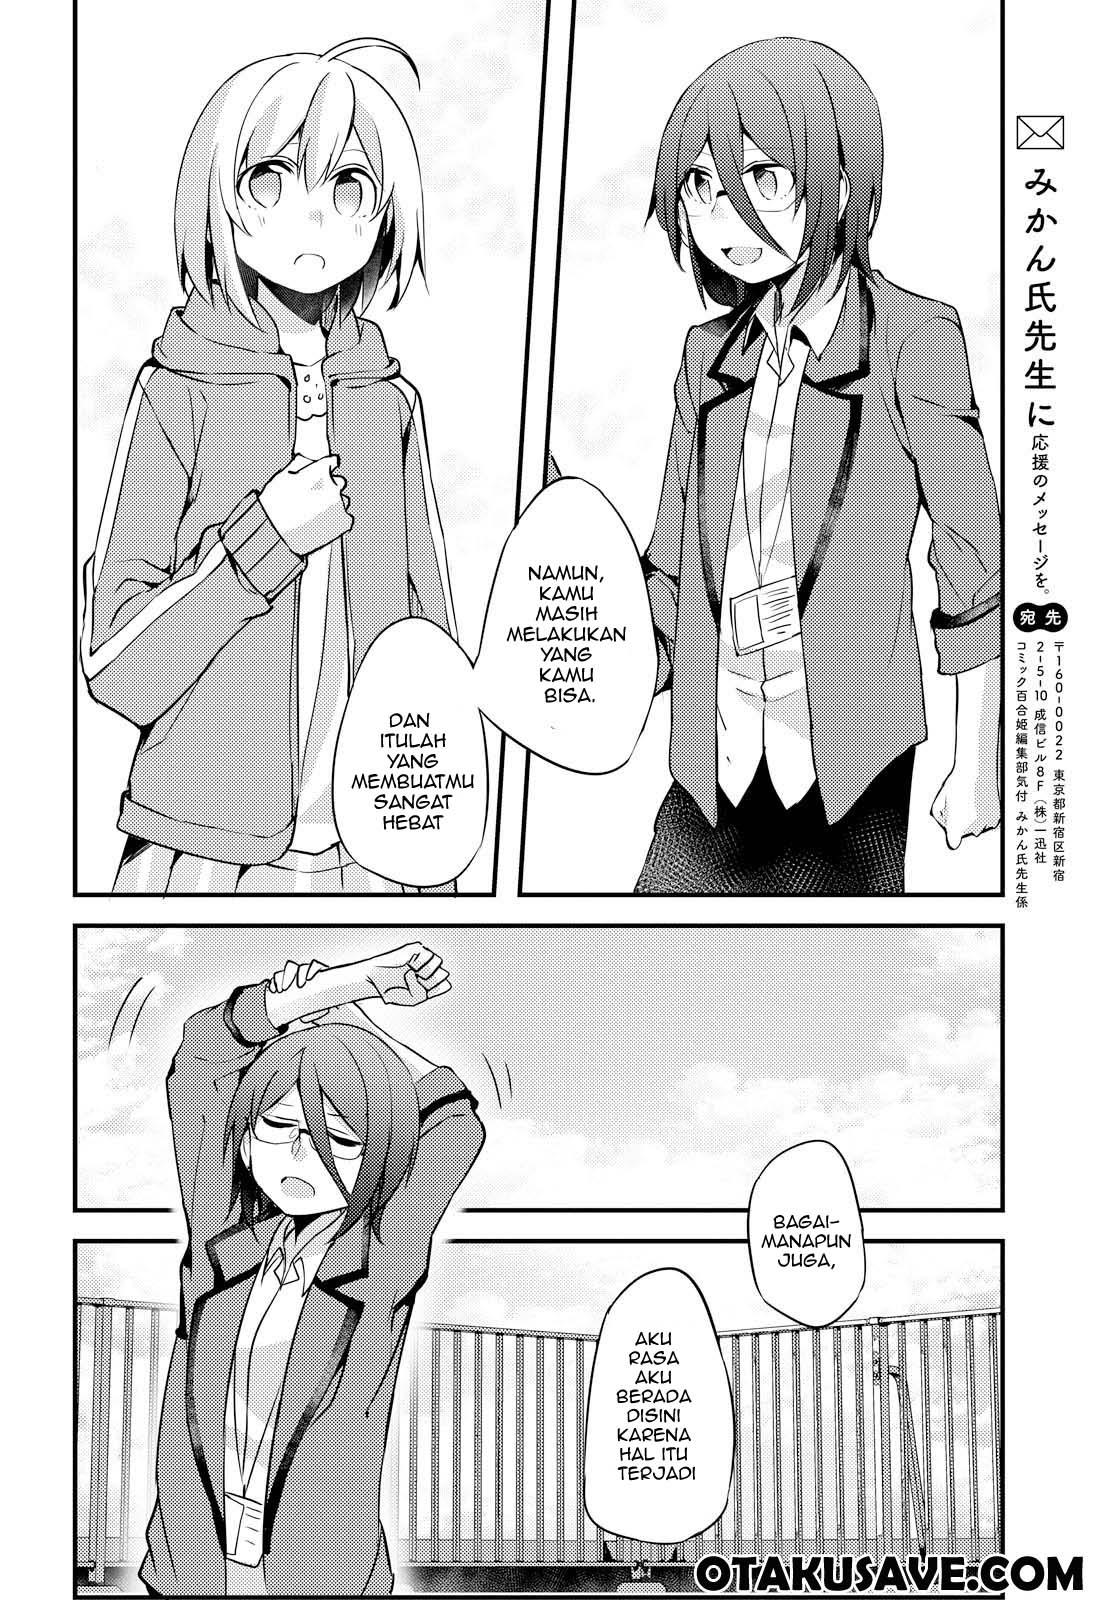 Baca Manga Now Loading Chapter 4 Bahasa Indonesia